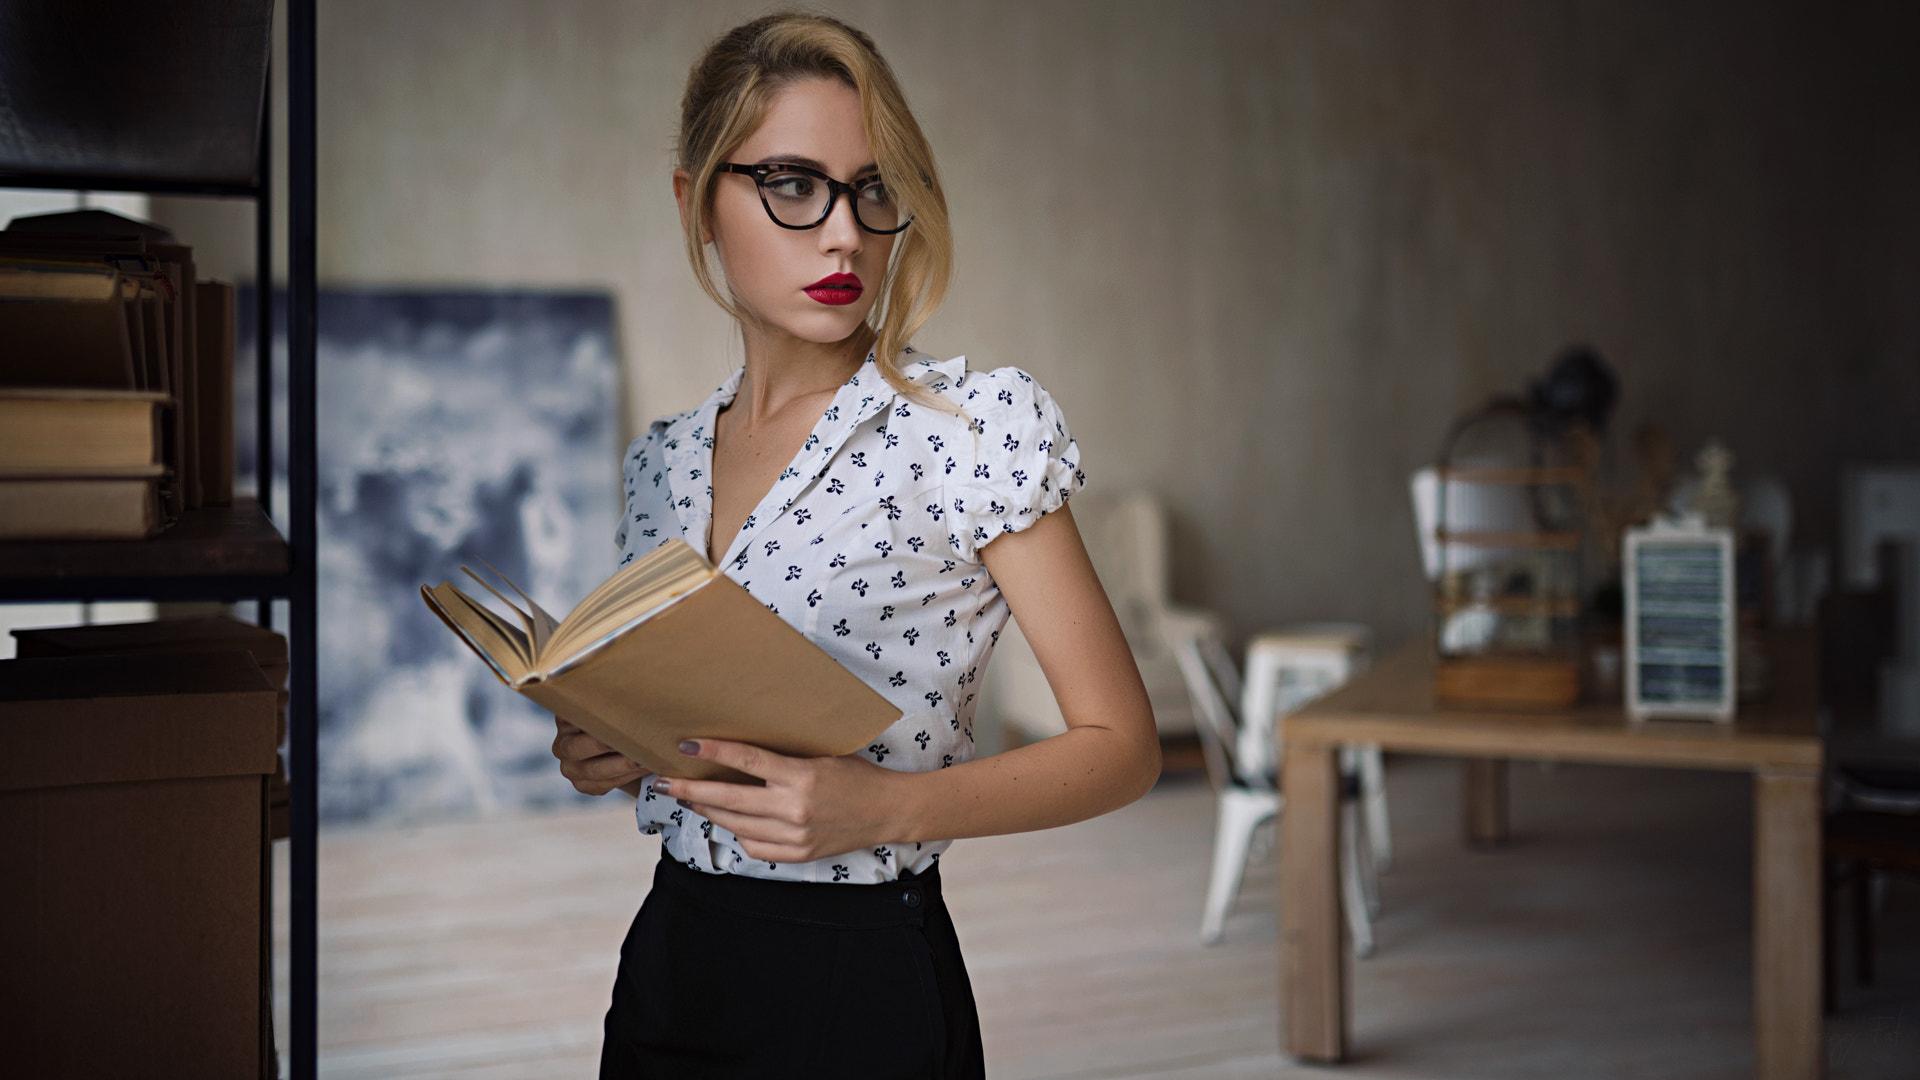 Women Sergey Fat Ksenia Kokoreva Red Lipstick Blonde Books Women With Glasses Portrait Looking Away  1920x1080